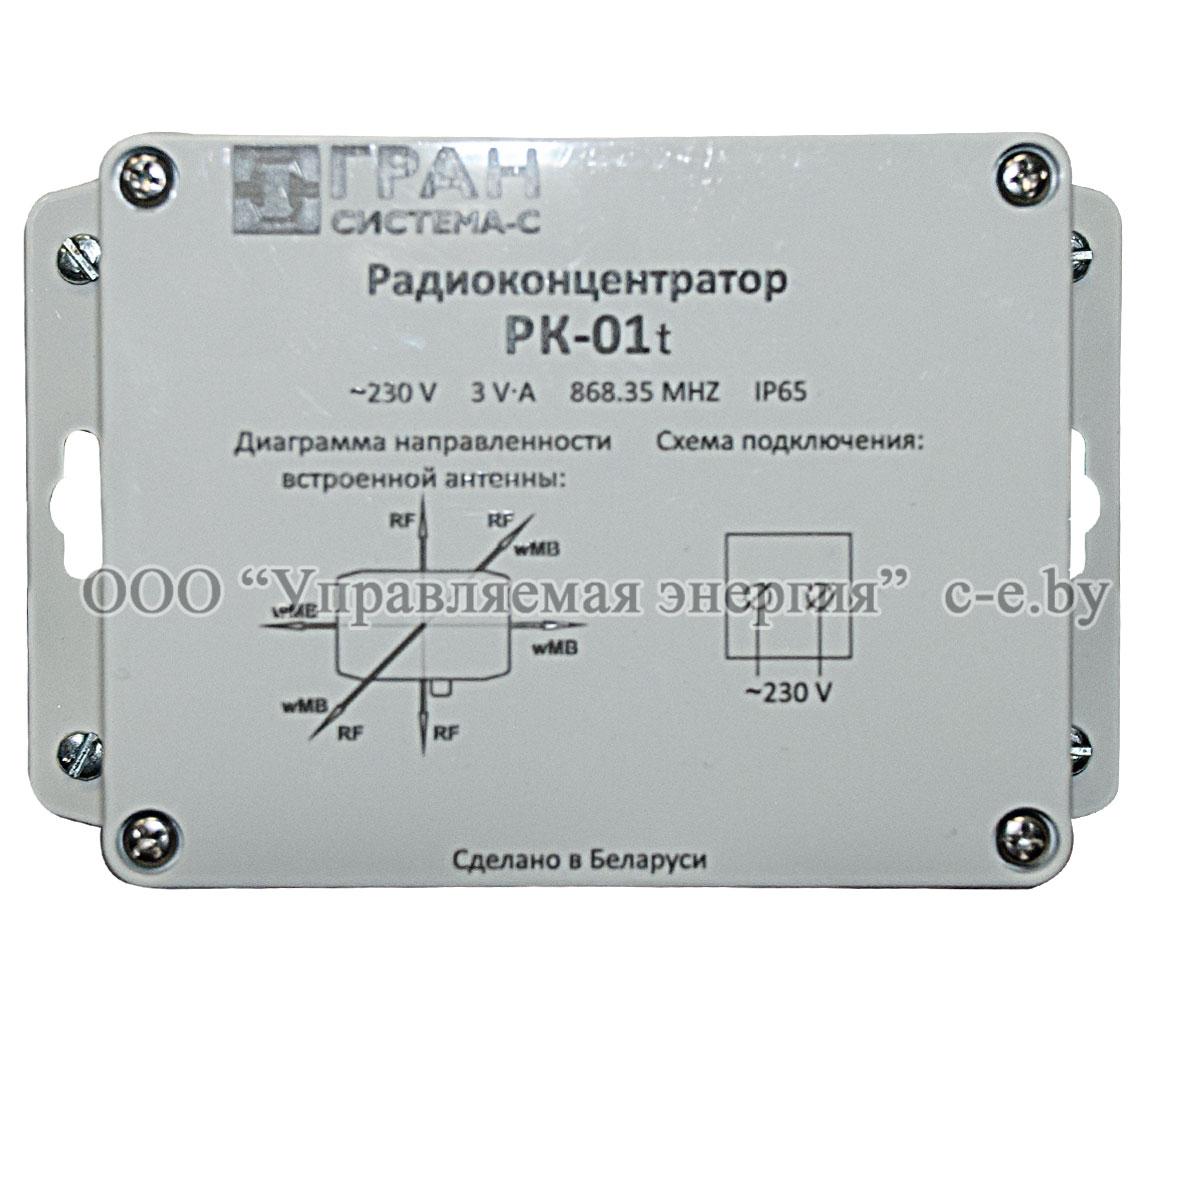 RК-01tA радиоконцентратор